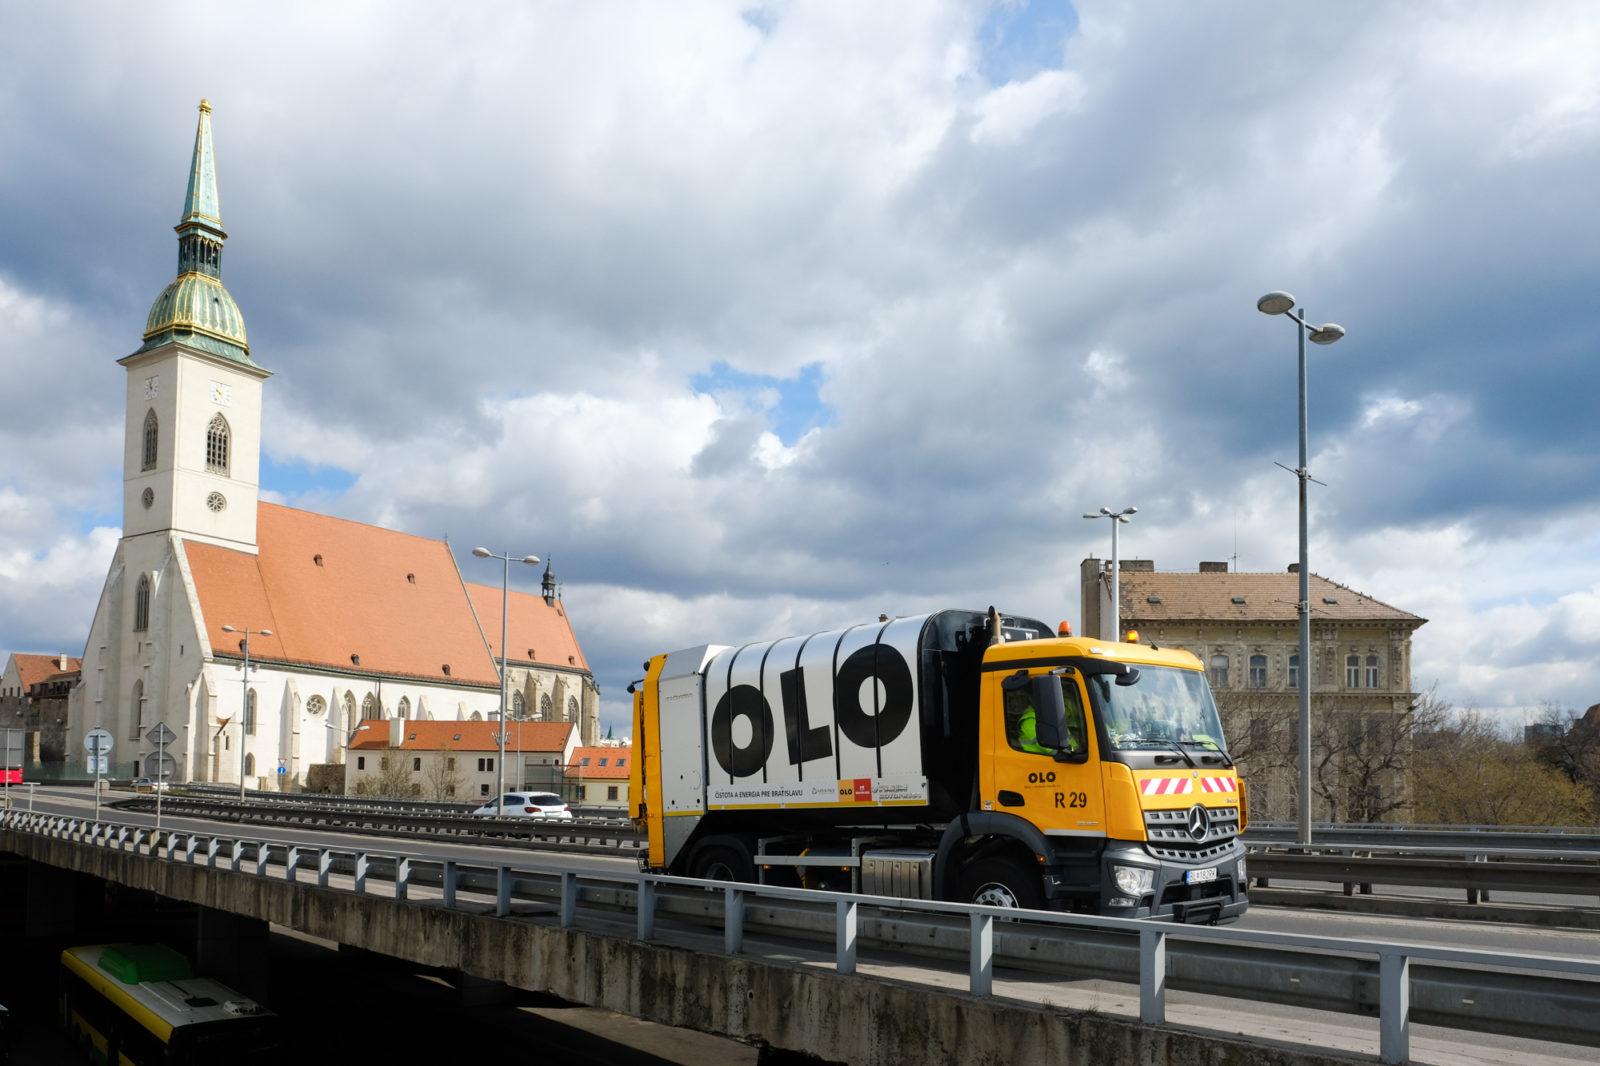 Olo Bratislava 2